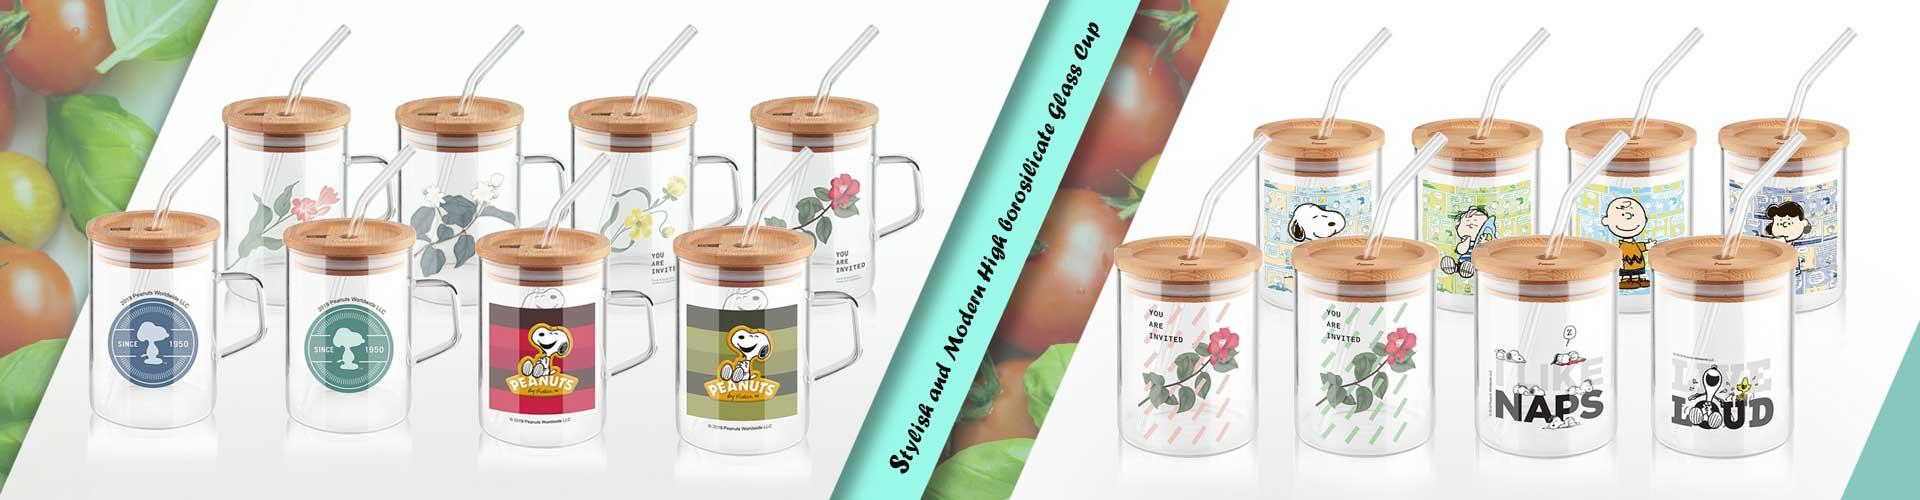 borosilicate glassware with straw